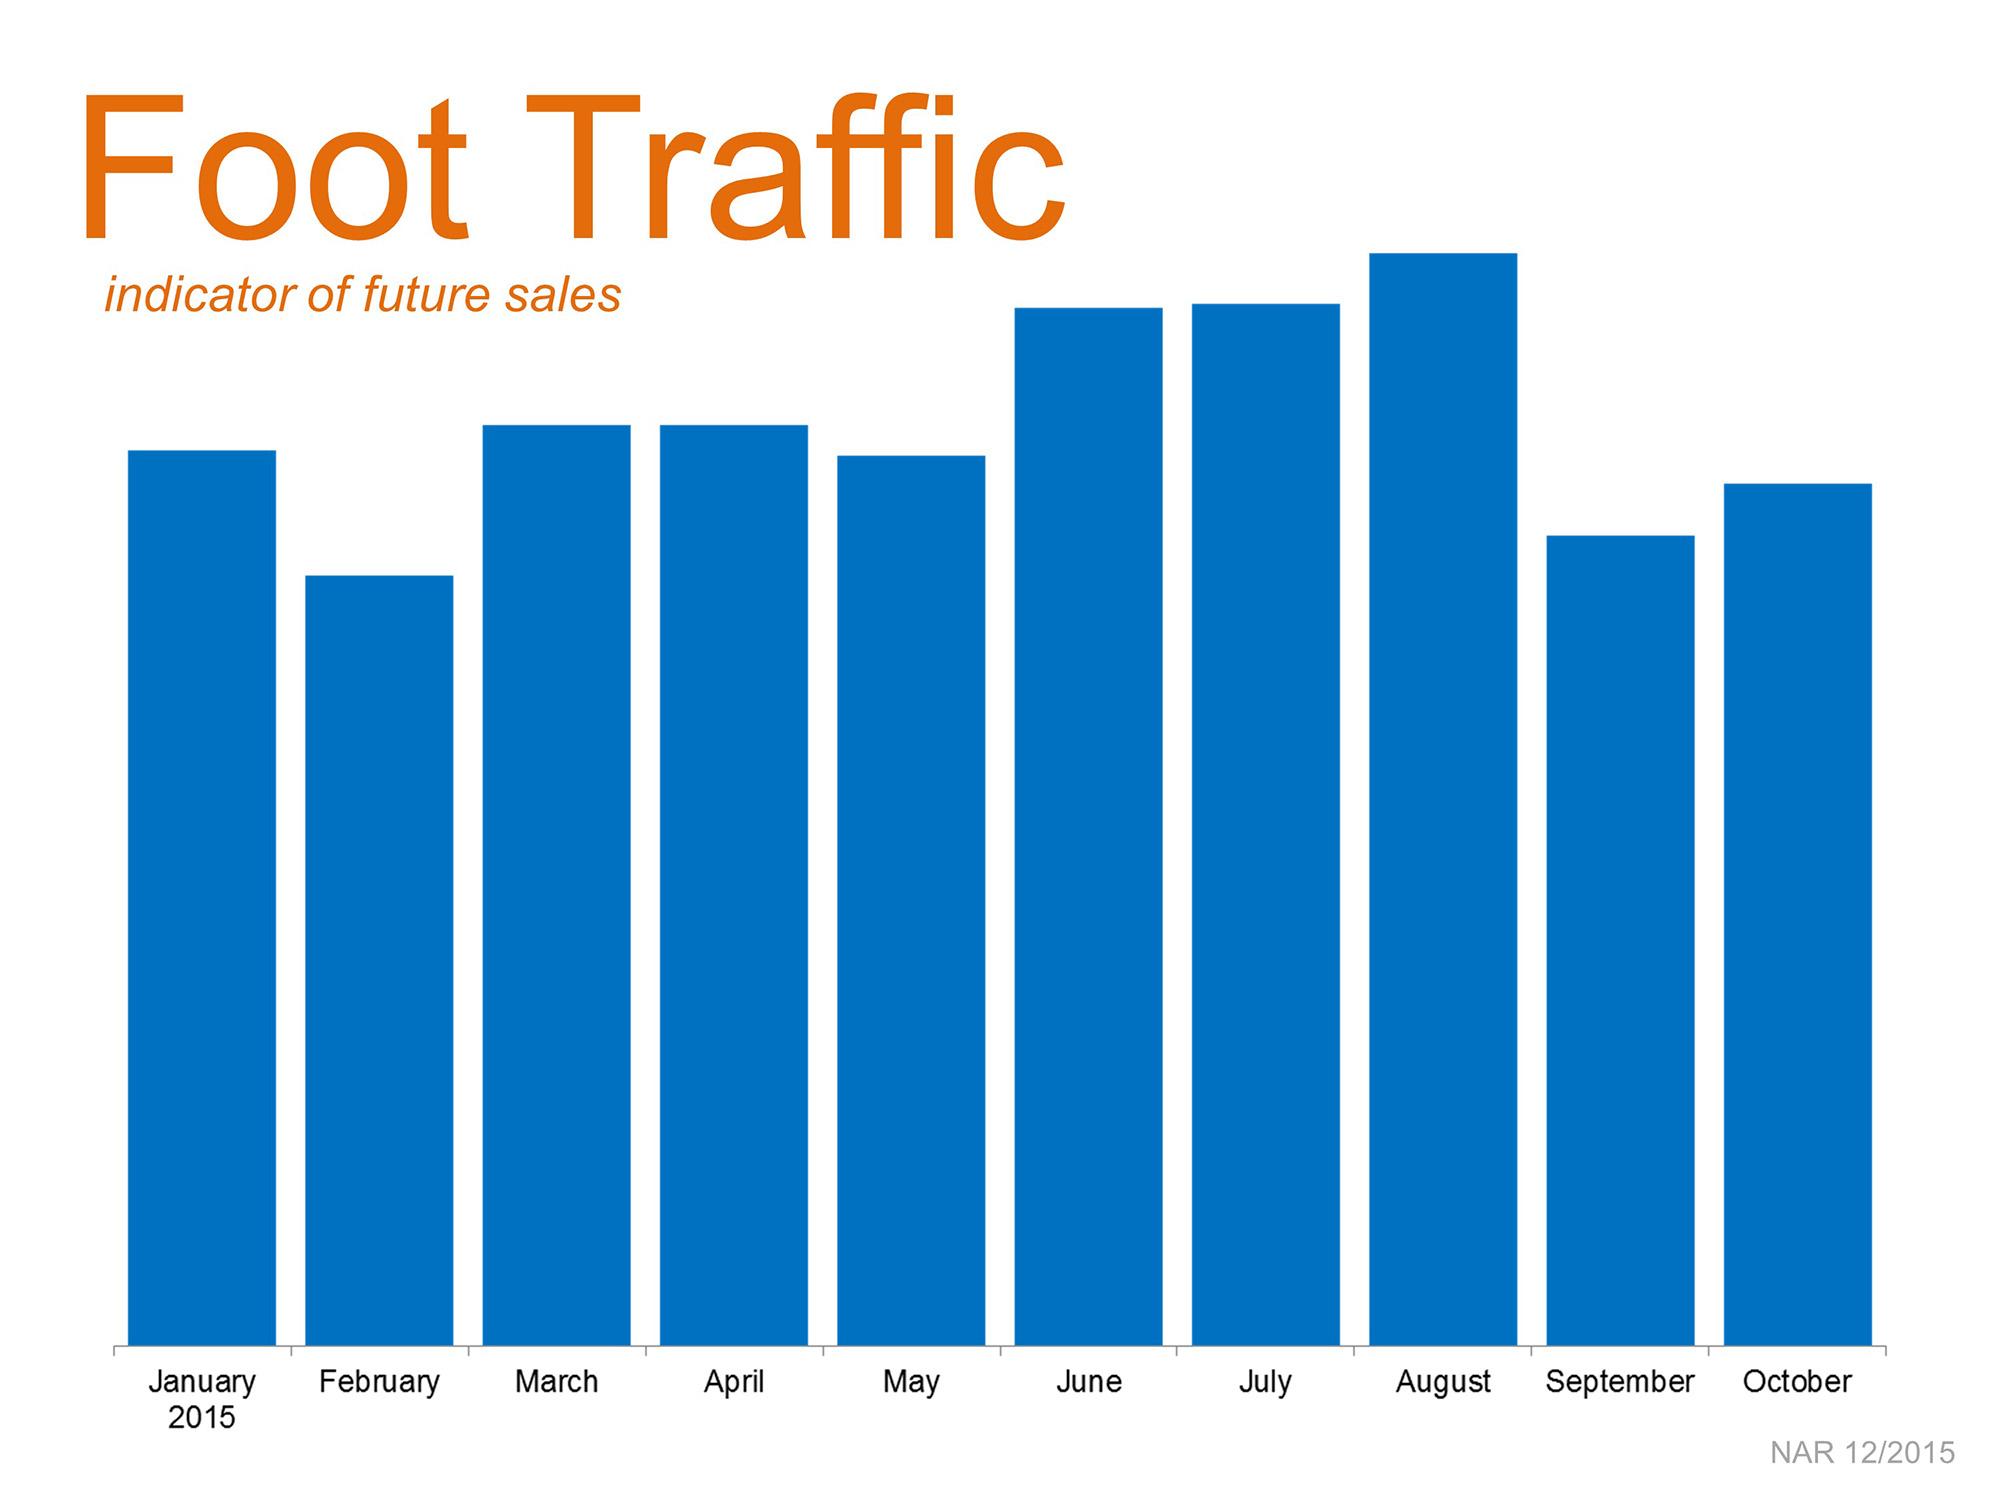 KCM Dec 15 - Foot Traffic